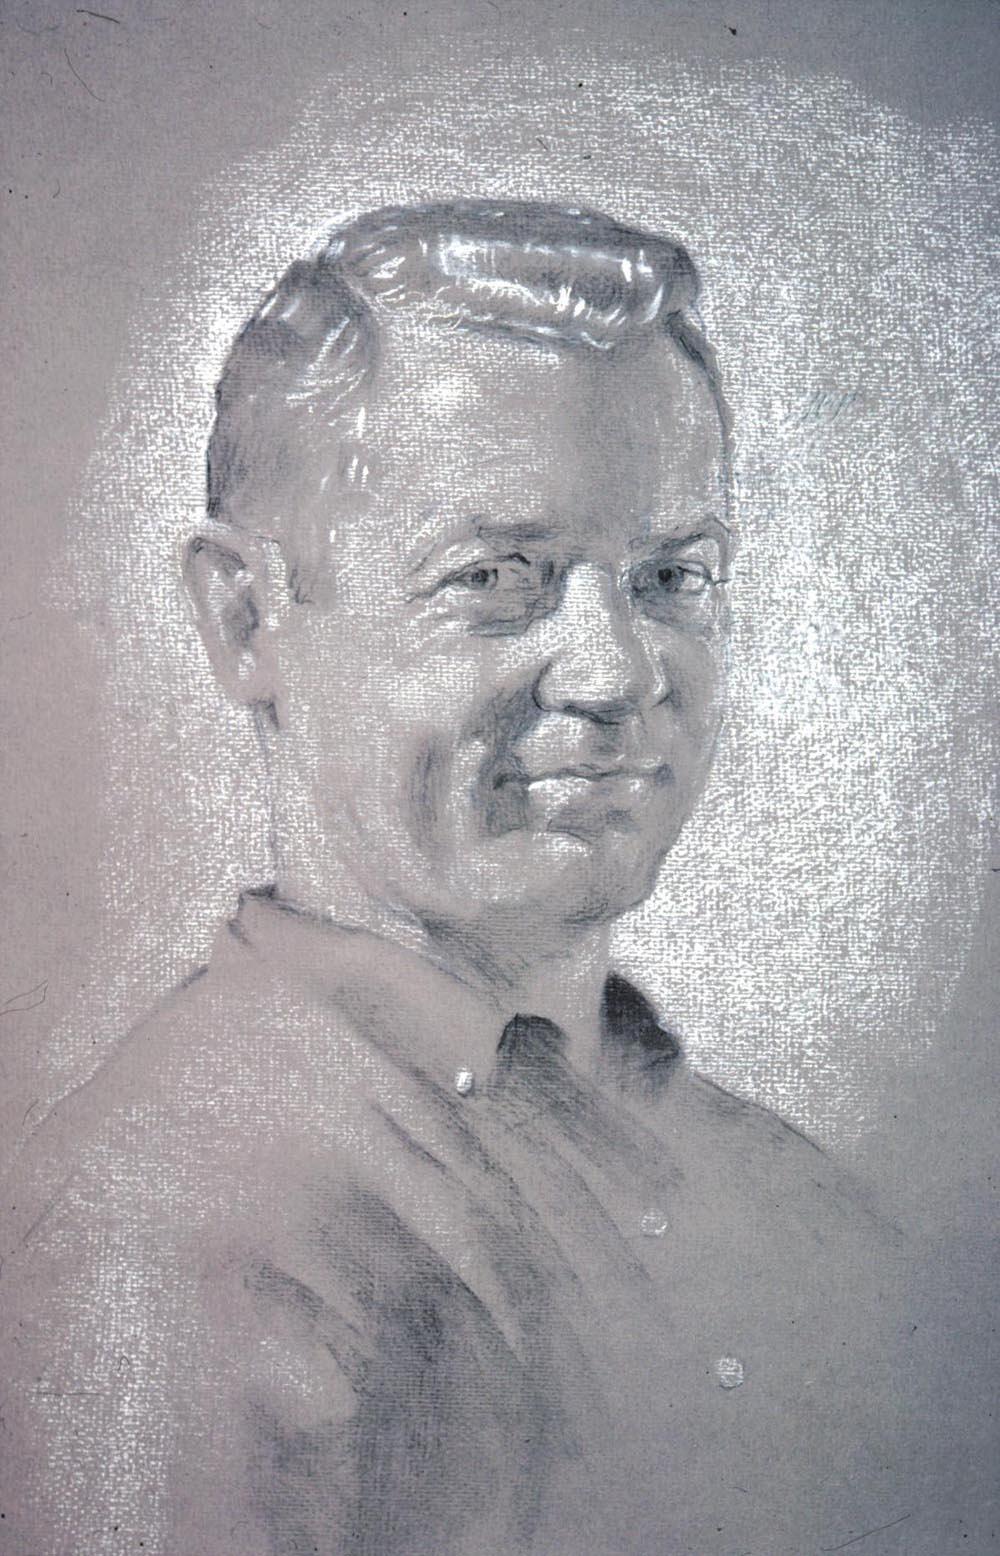 David Hardy. Portrait of a man